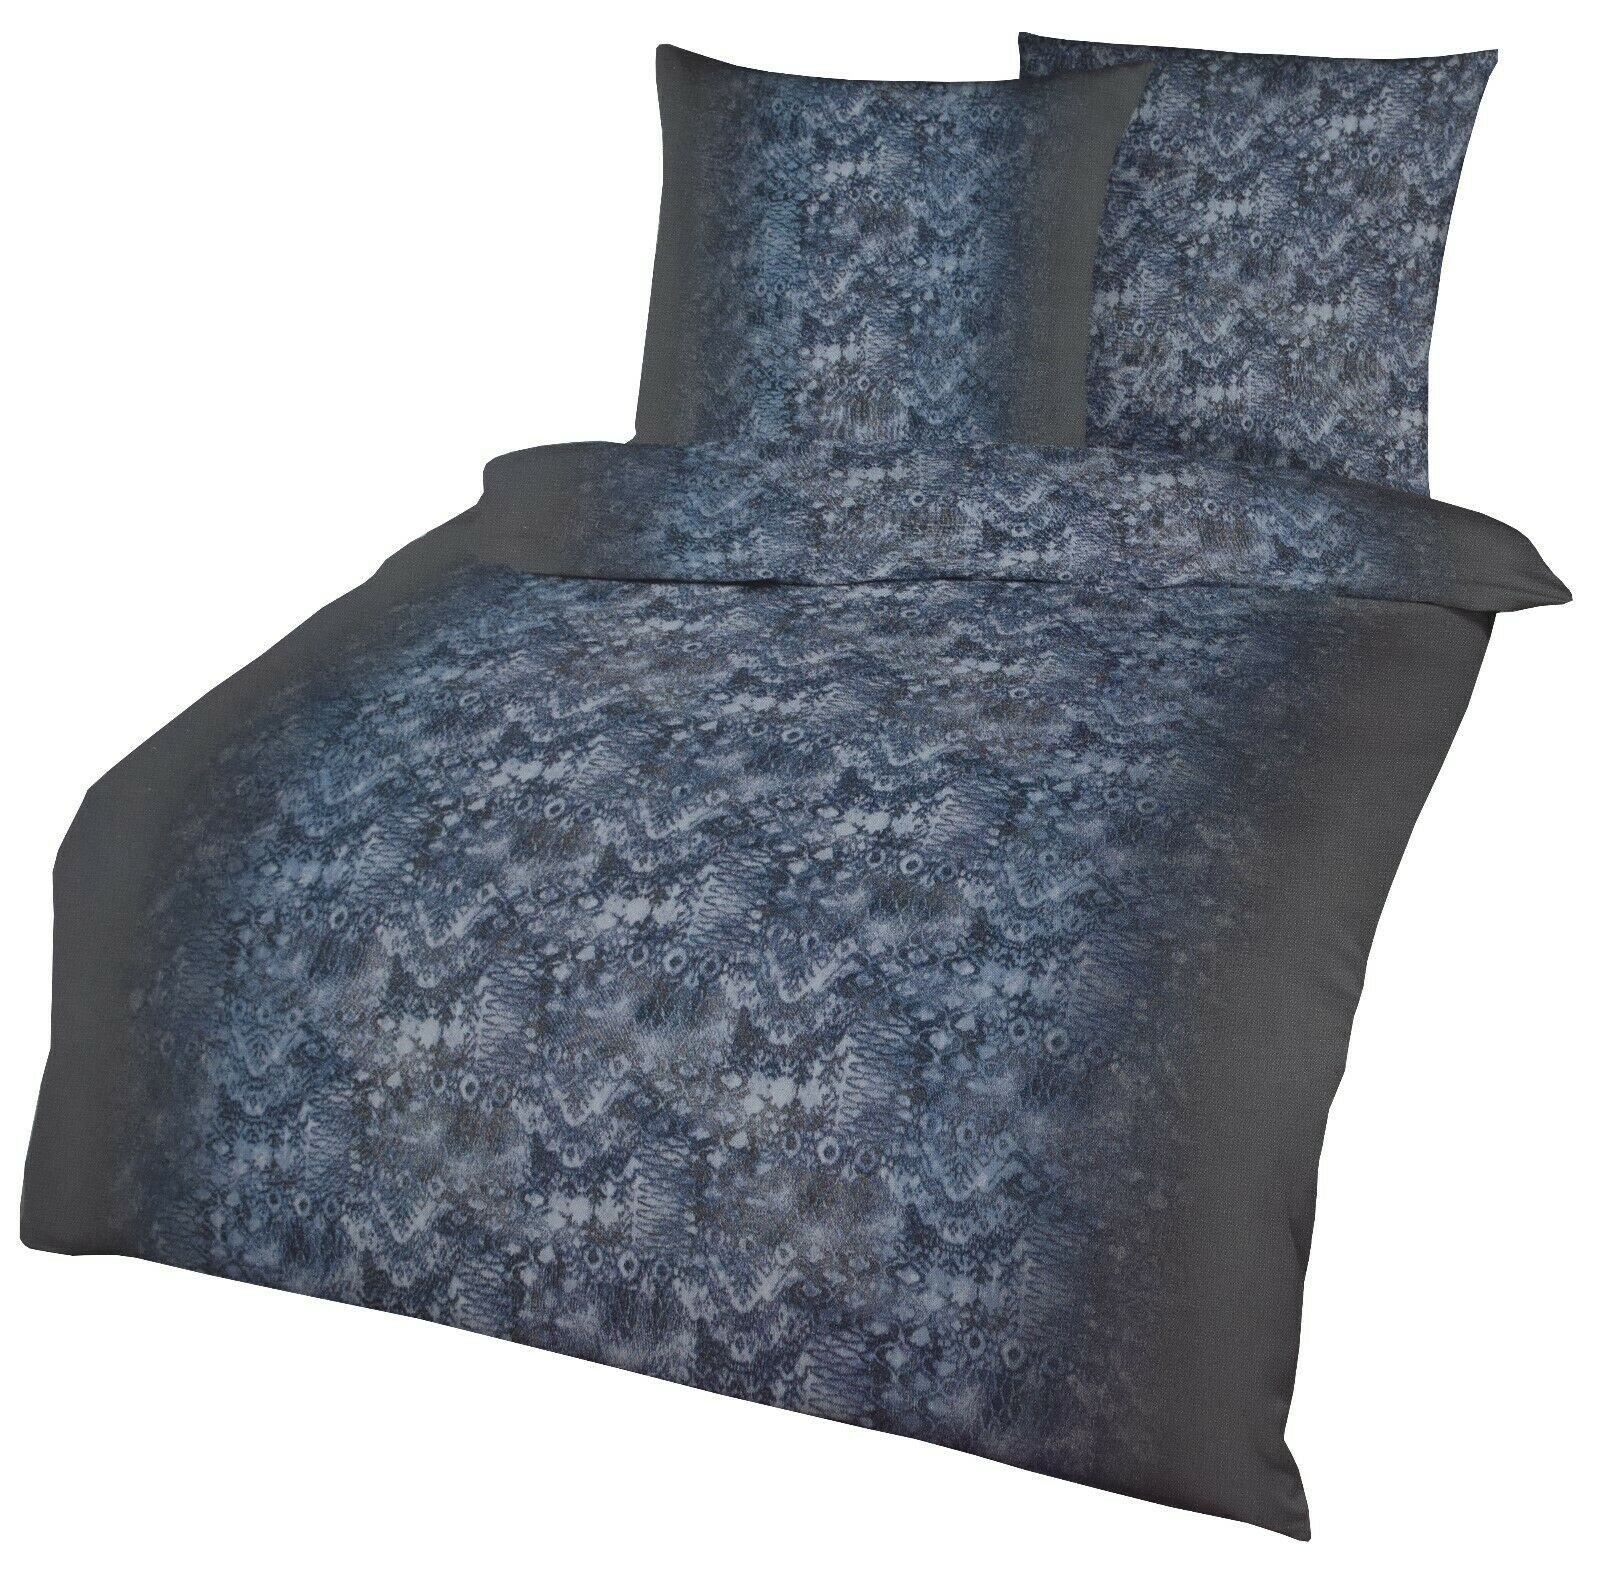 Full Size of Lustige Bettwäsche 155x220 T Shirt Sprüche T Shirt Wohnzimmer Lustige Bettwäsche 155x220